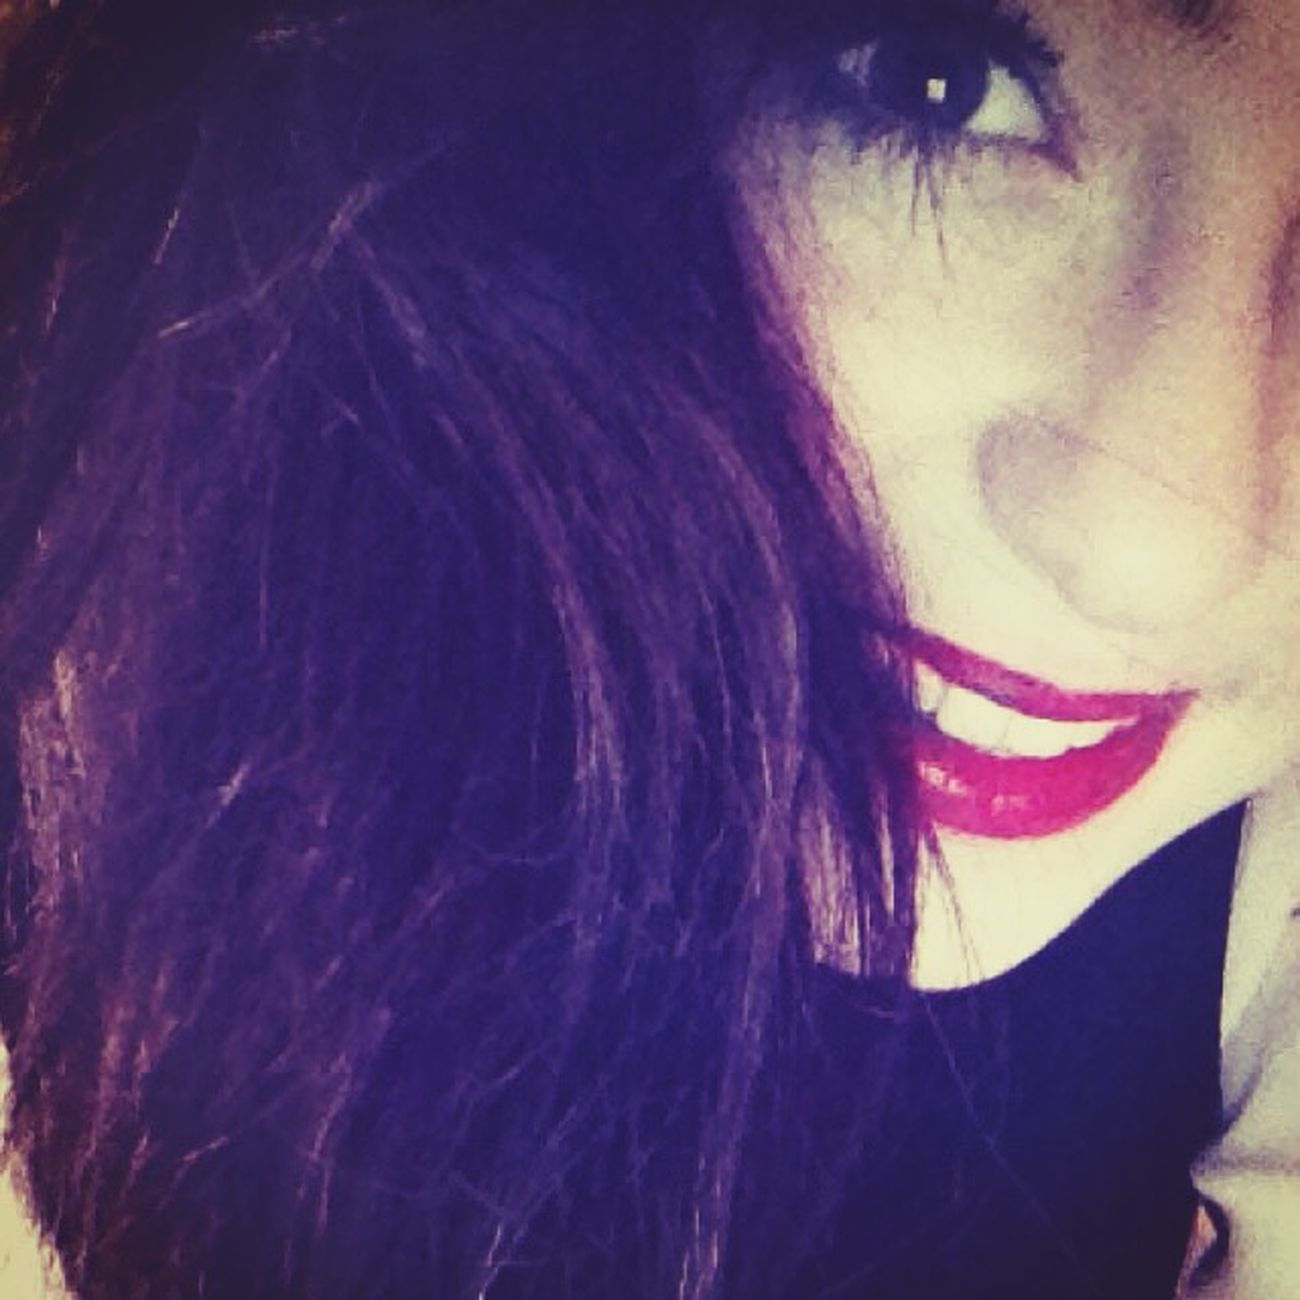 Braces Off Self Portrait Enjoying Life Mua LoveYourself It's Okay, I'd Be Jealous Too Hot Selfie ✌ Blue Eyes Love Me